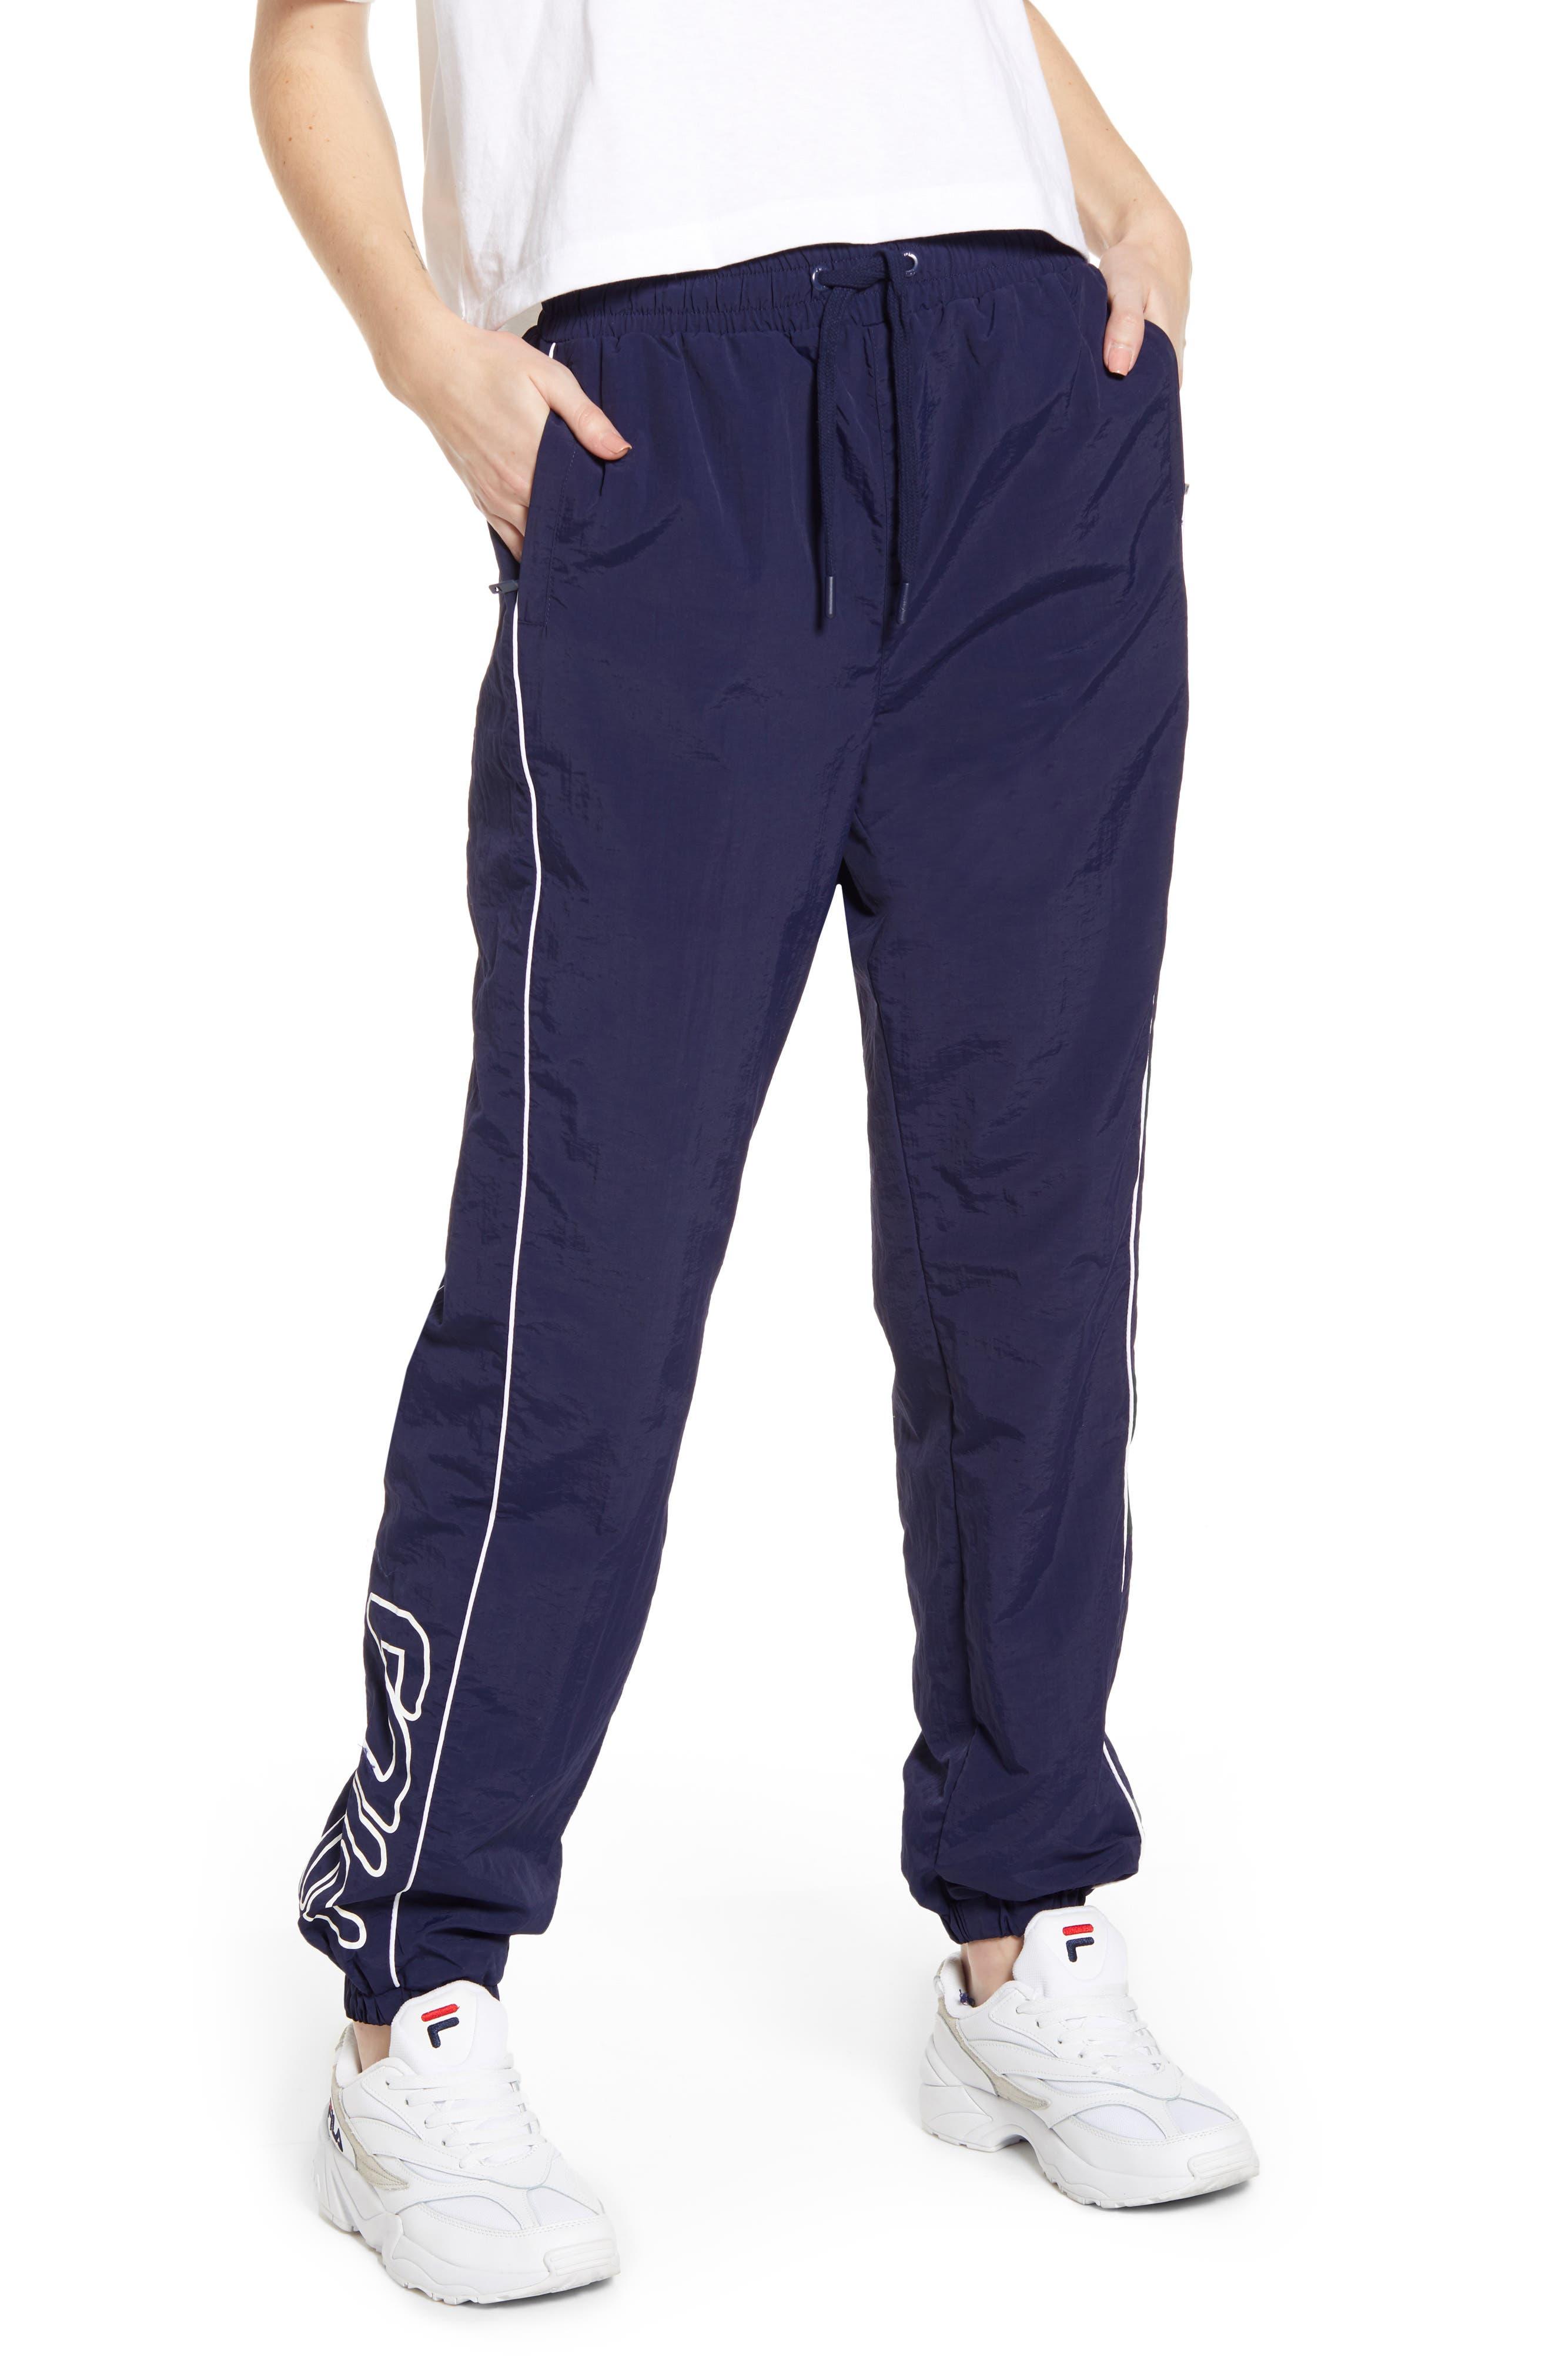 80d75b5dccfbf Buy fila pants for women - Best women's fila pants shop - Cools.com